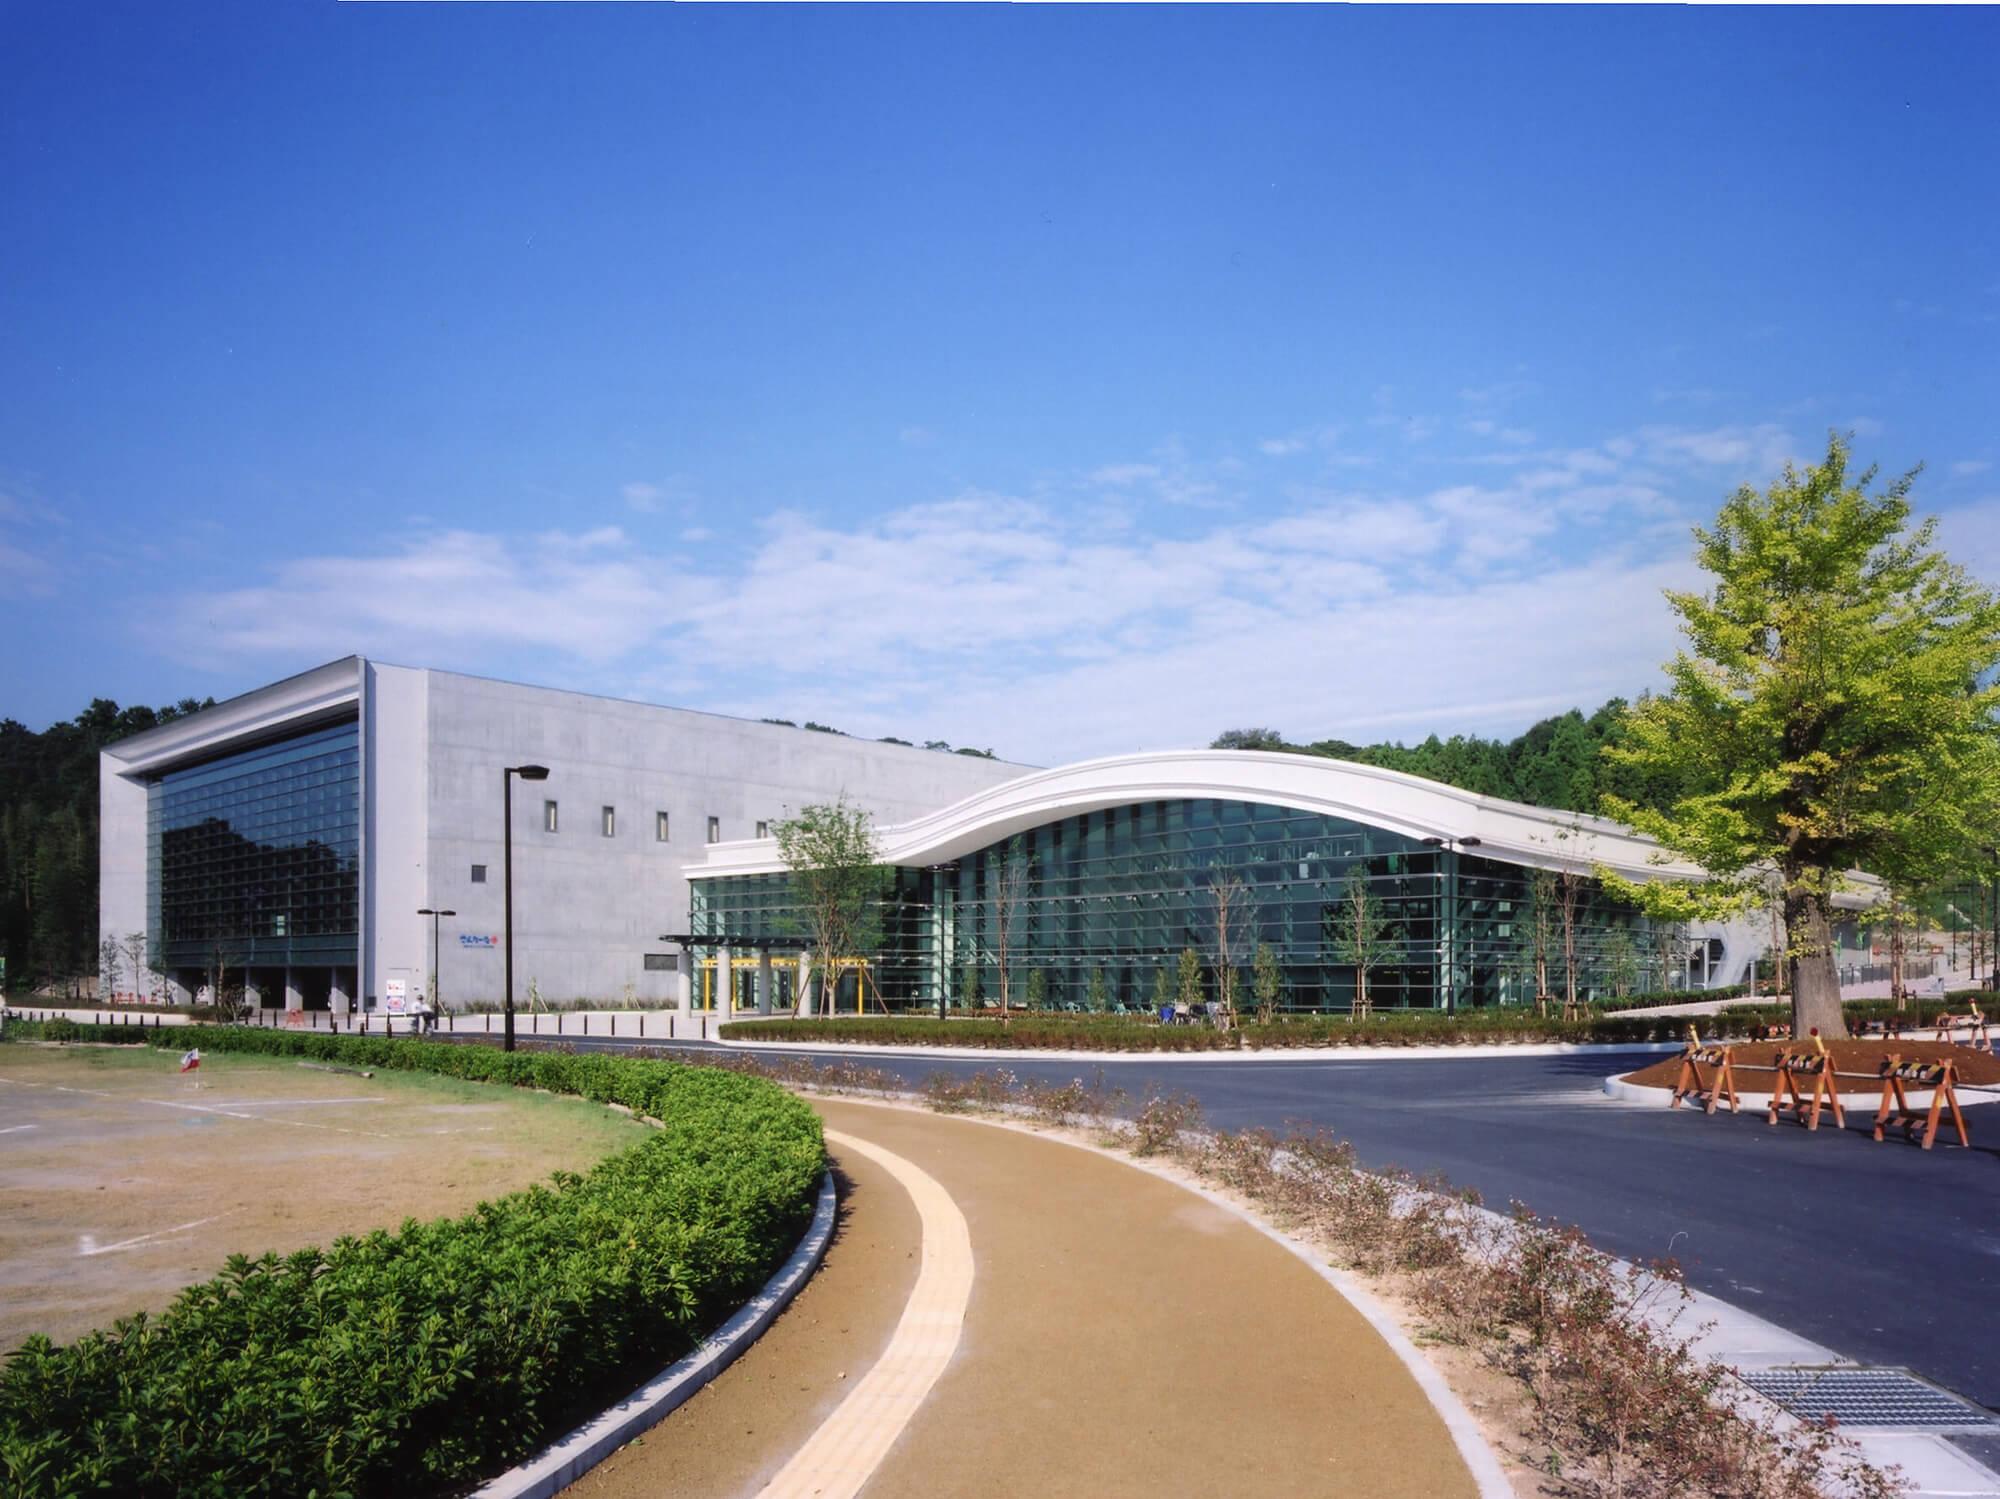 Nagoya Civic General Gymnasium Nippongaishi Sports Plaza